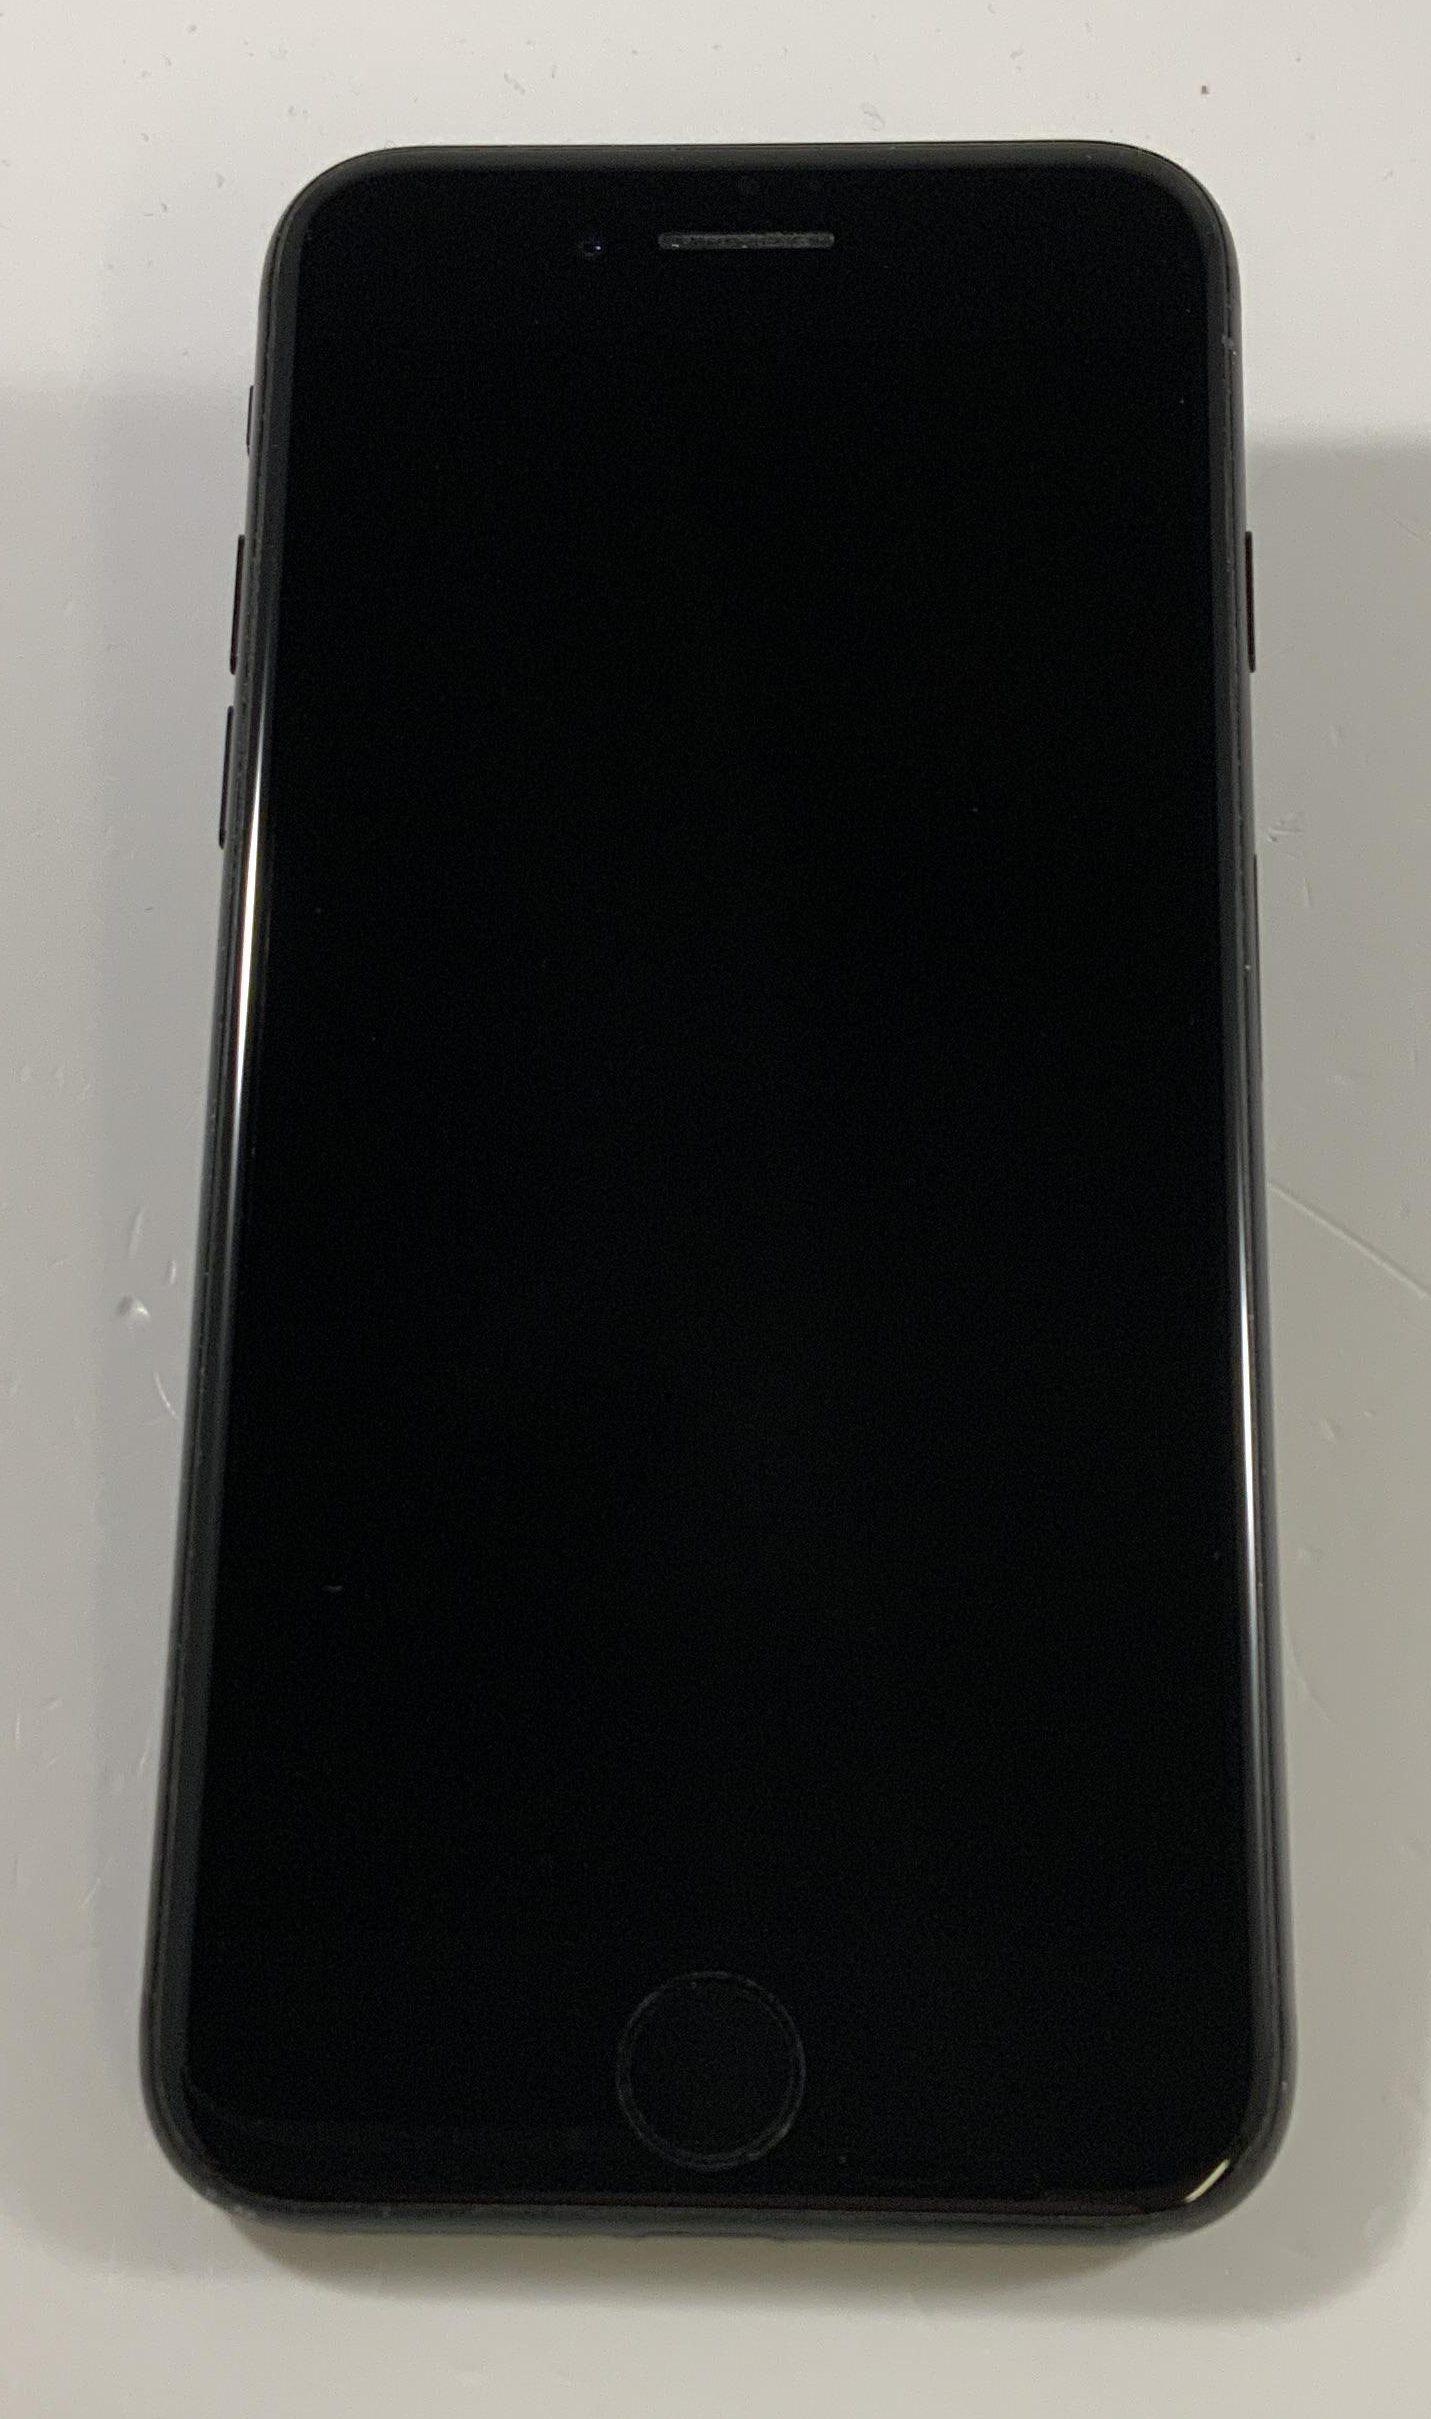 iPhone 7 32GB, 32GB, Black, Bild 1